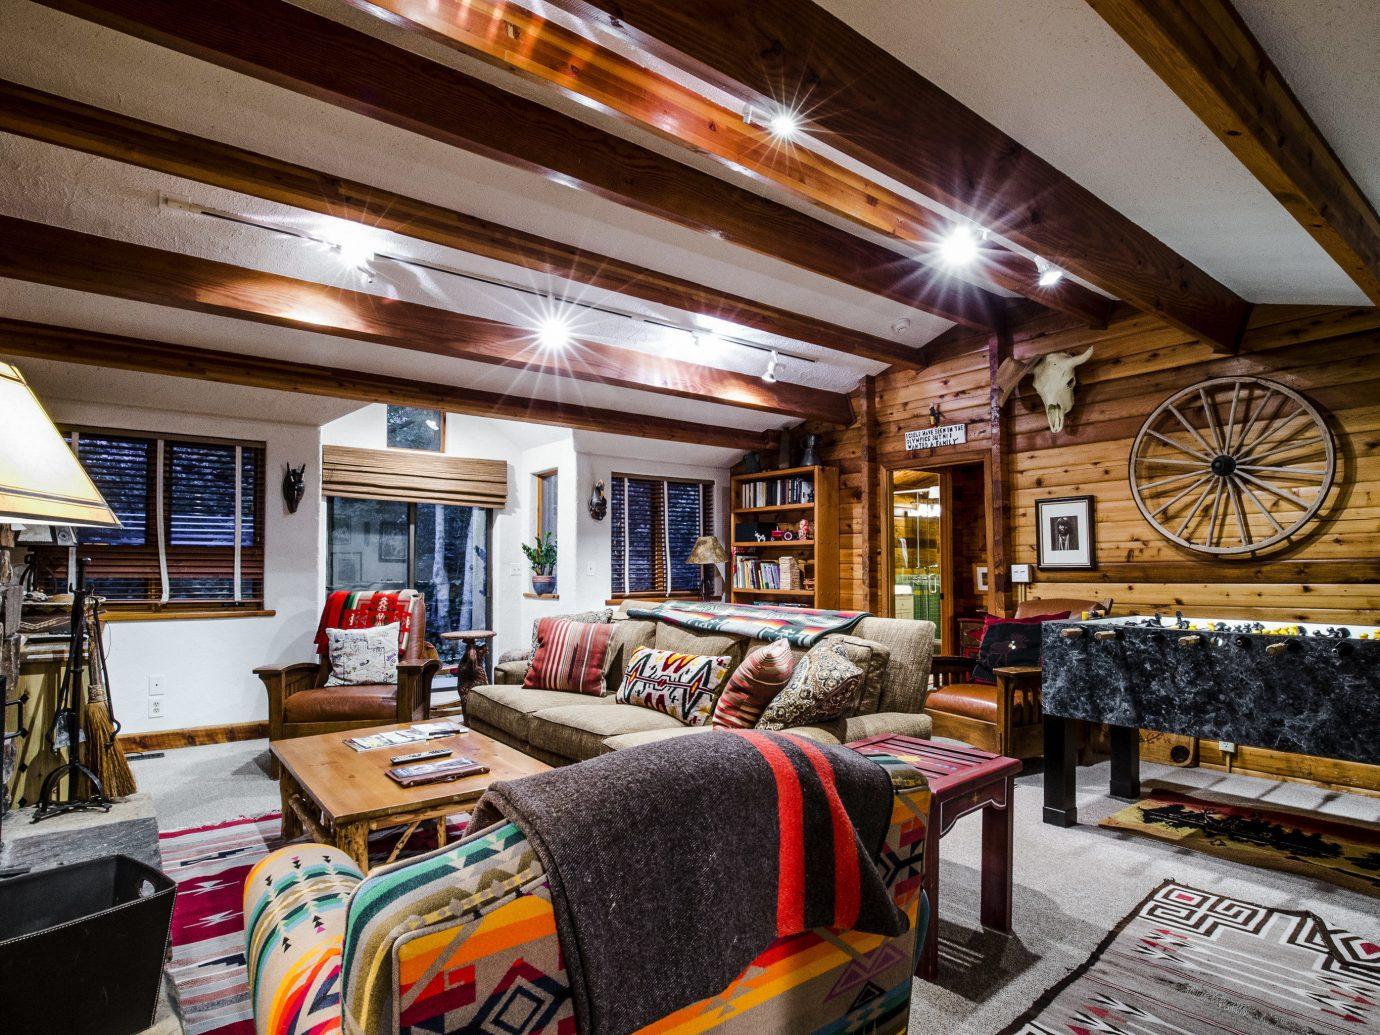 Celebs Hotels Trip Ideas indoor room ceiling Living interior design home wood living room real estate furniture area decorated